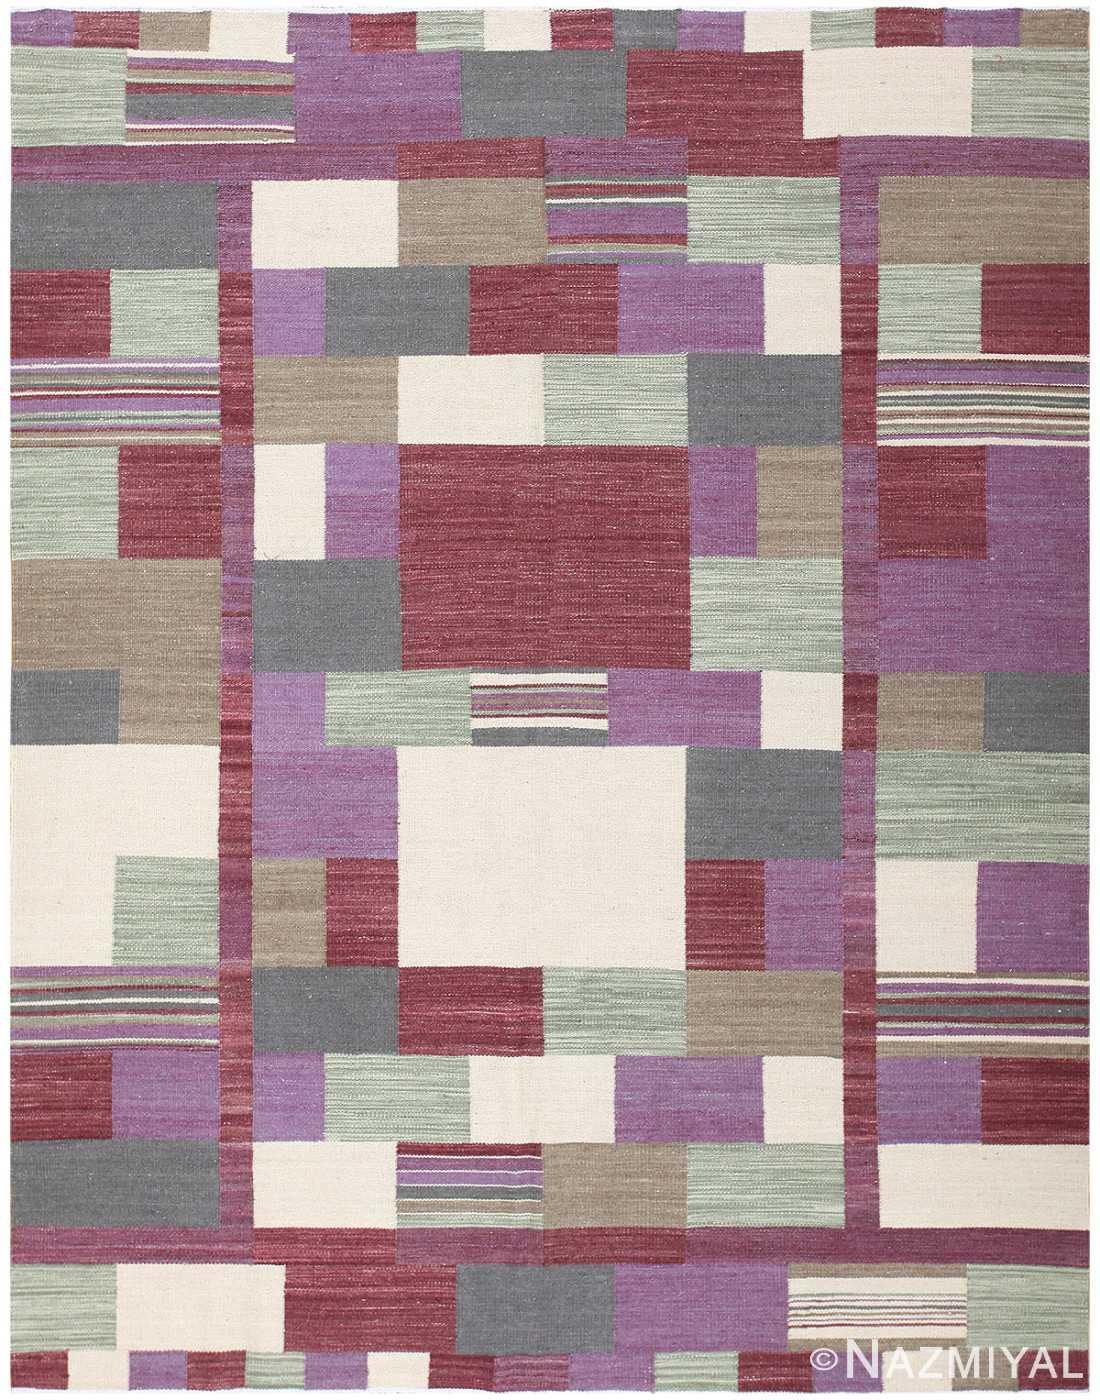 Swedish Inspired Modern Contemporary Carpet 48480 Nazmiyal